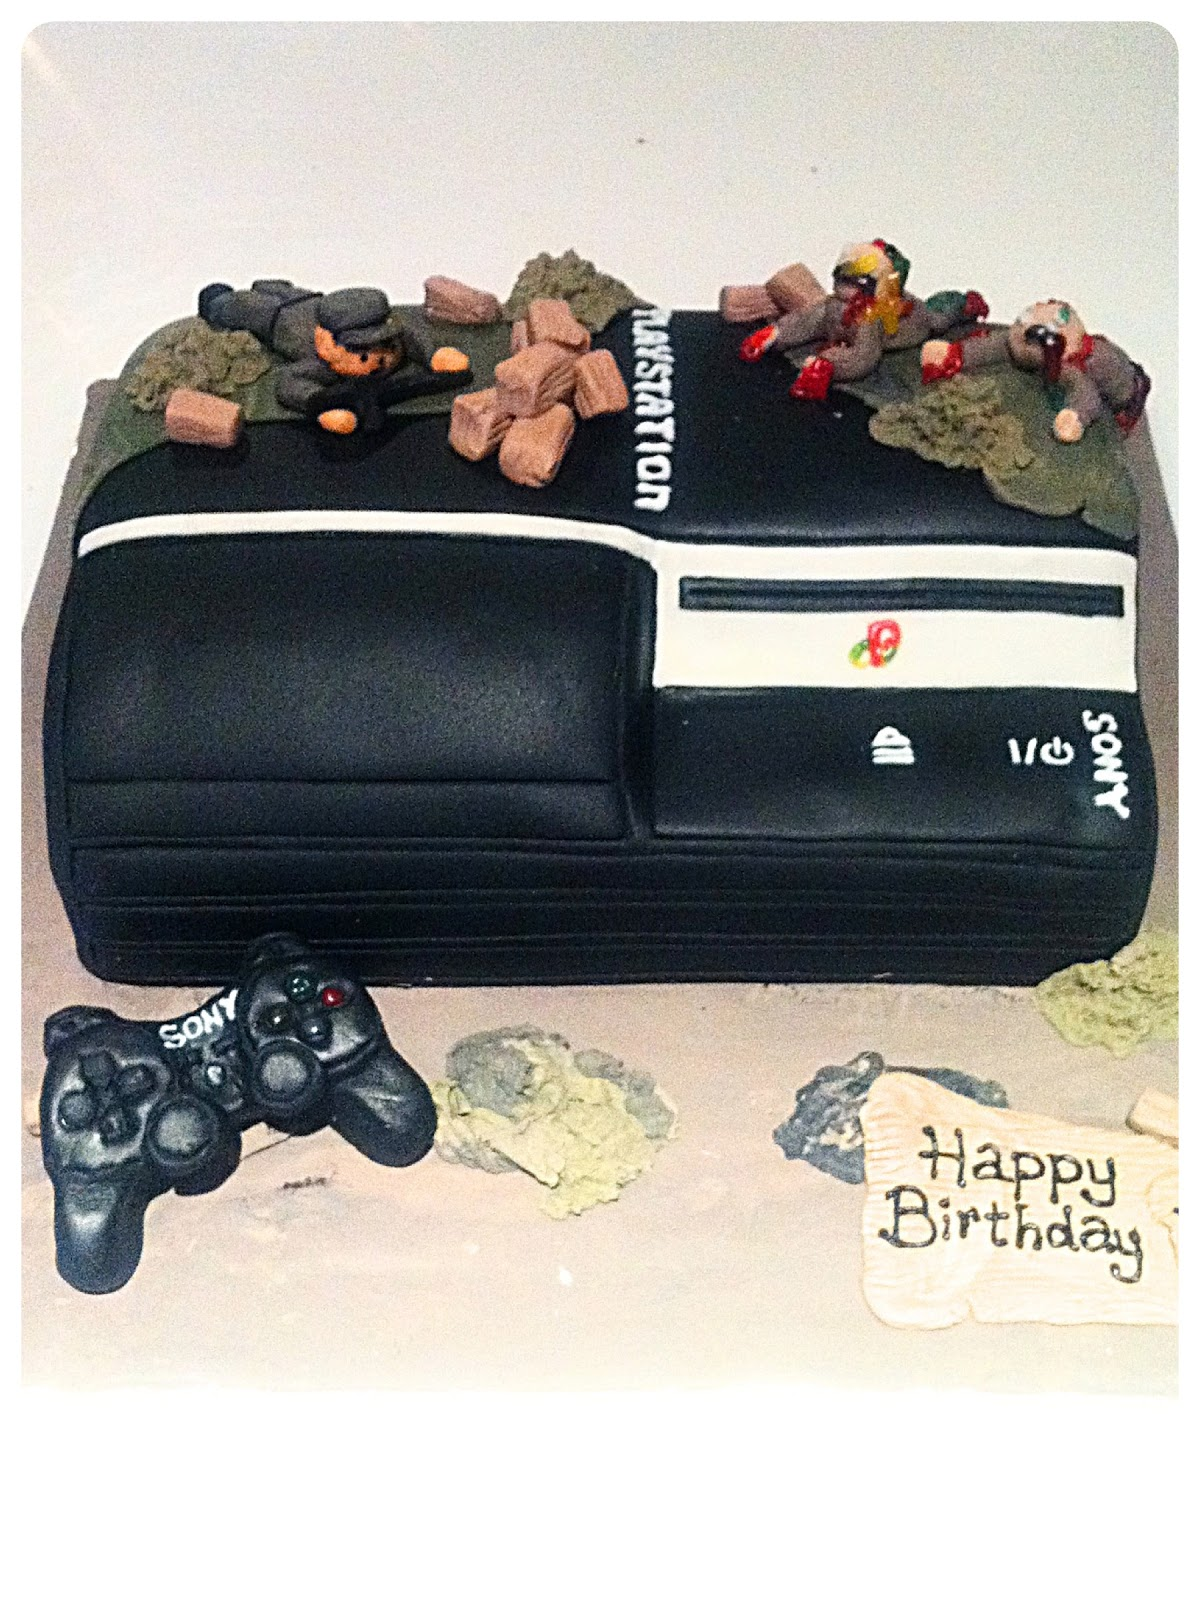 Playstation PS3 Birthday Cake London Cherie Kelly